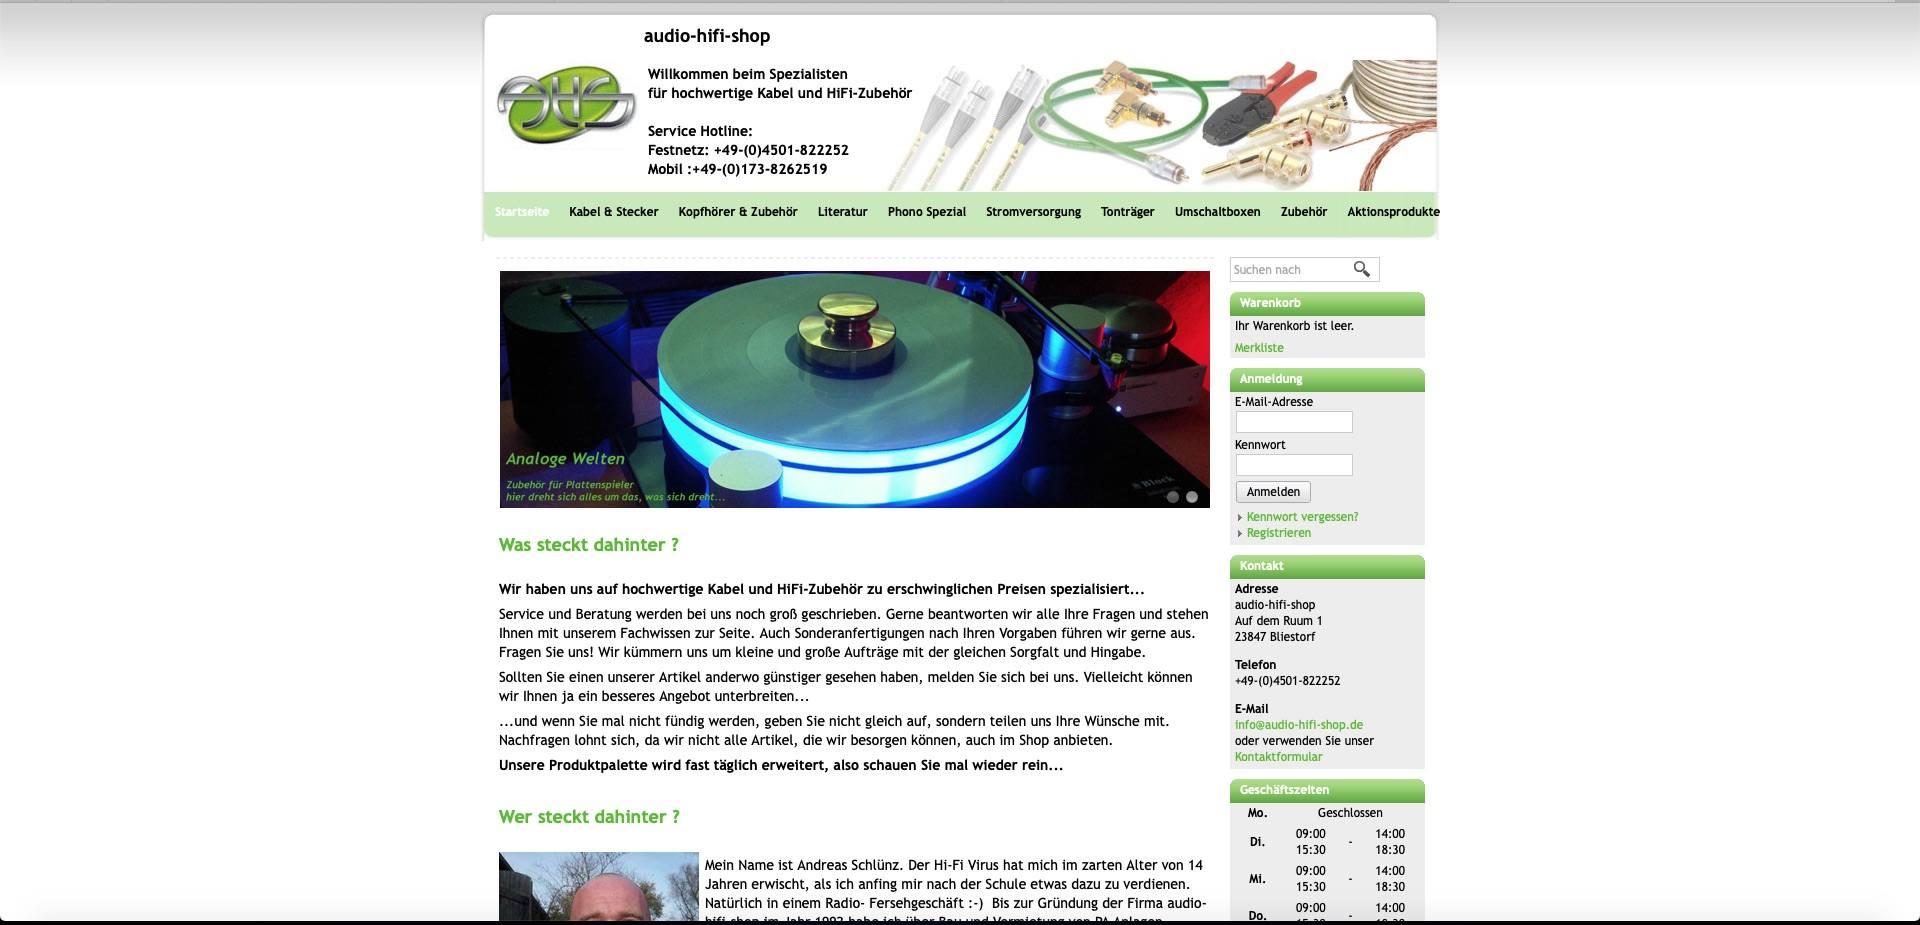 Bildschirmfoto von audio-hifi-shop.de